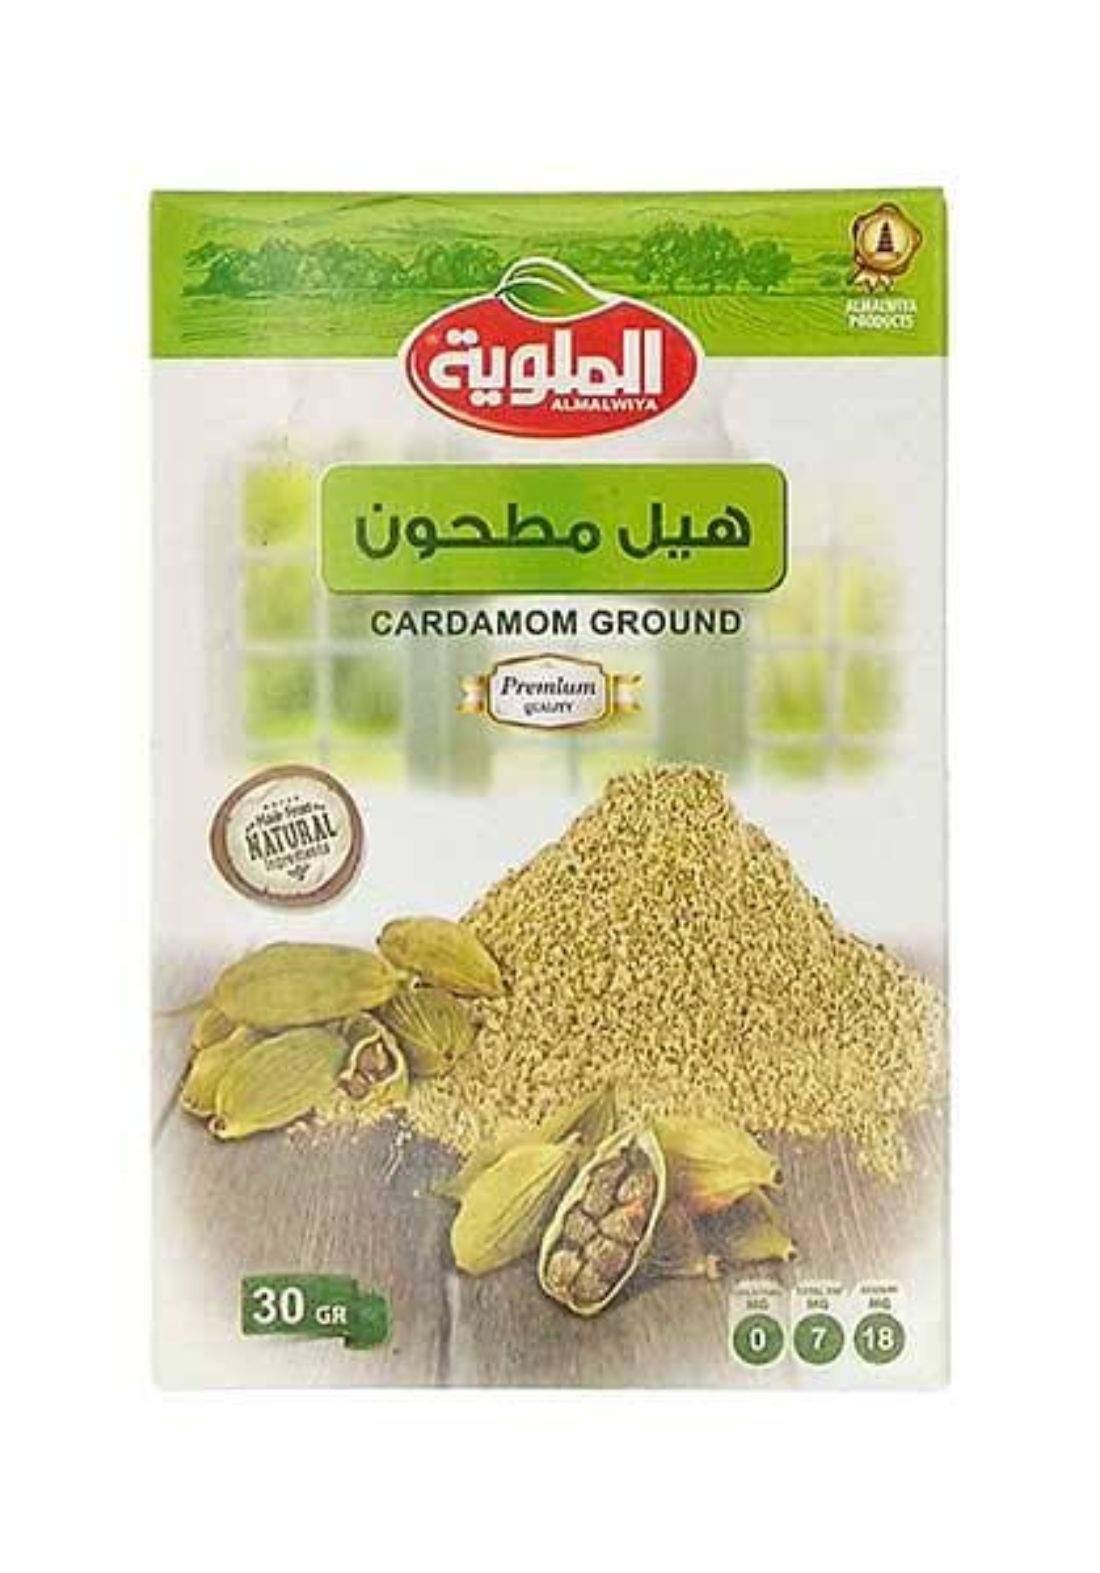 Cardamom ground 30g الملوية هيل مطحون